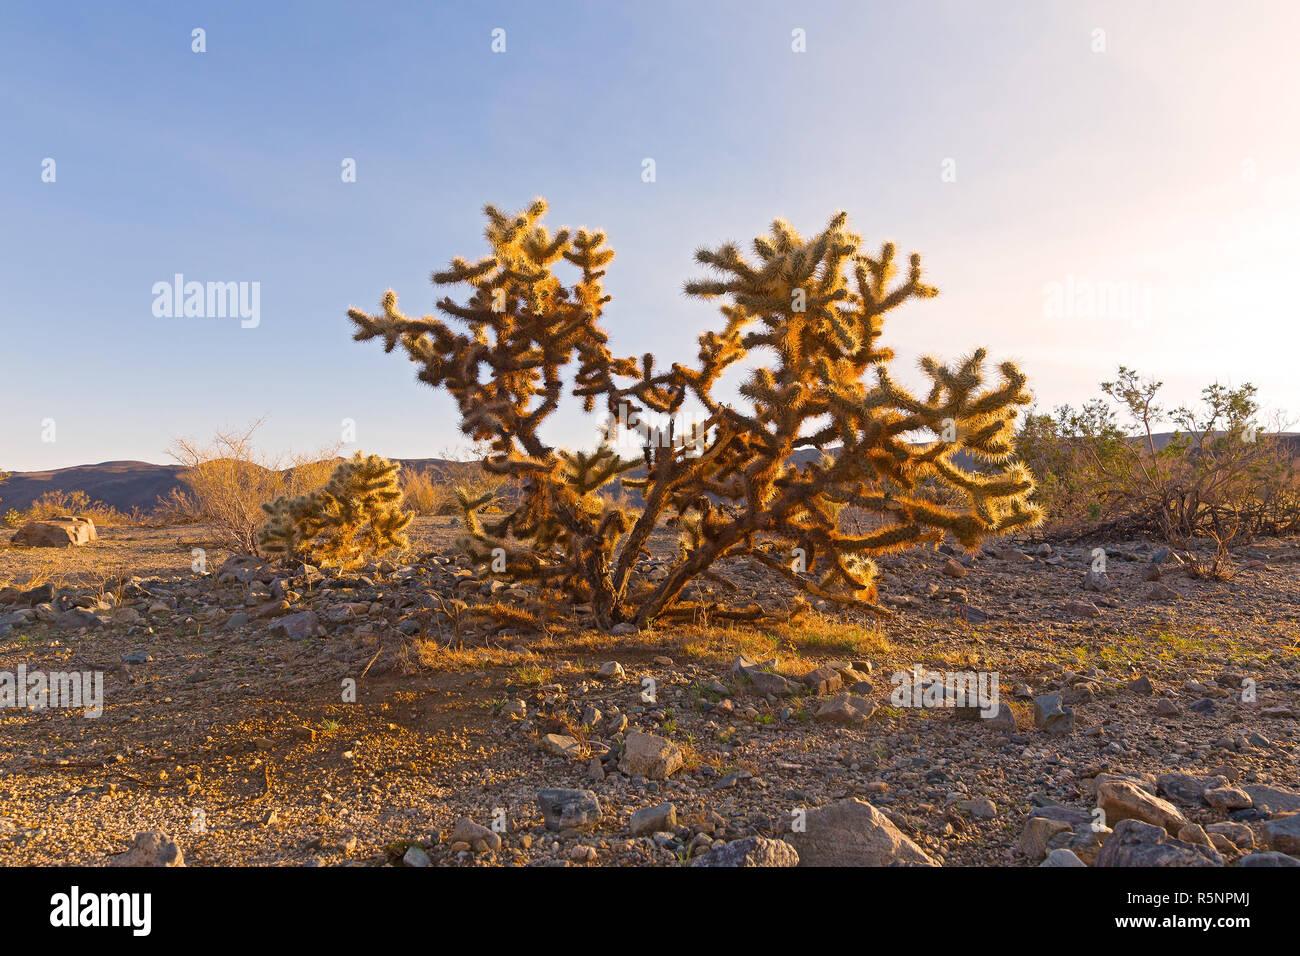 The cactus shrub called teddy-bear cholla at desert sunset. Cactus plant native to northwestern Mexico and to California, Arizona and Nevada, USA. - Stock Image